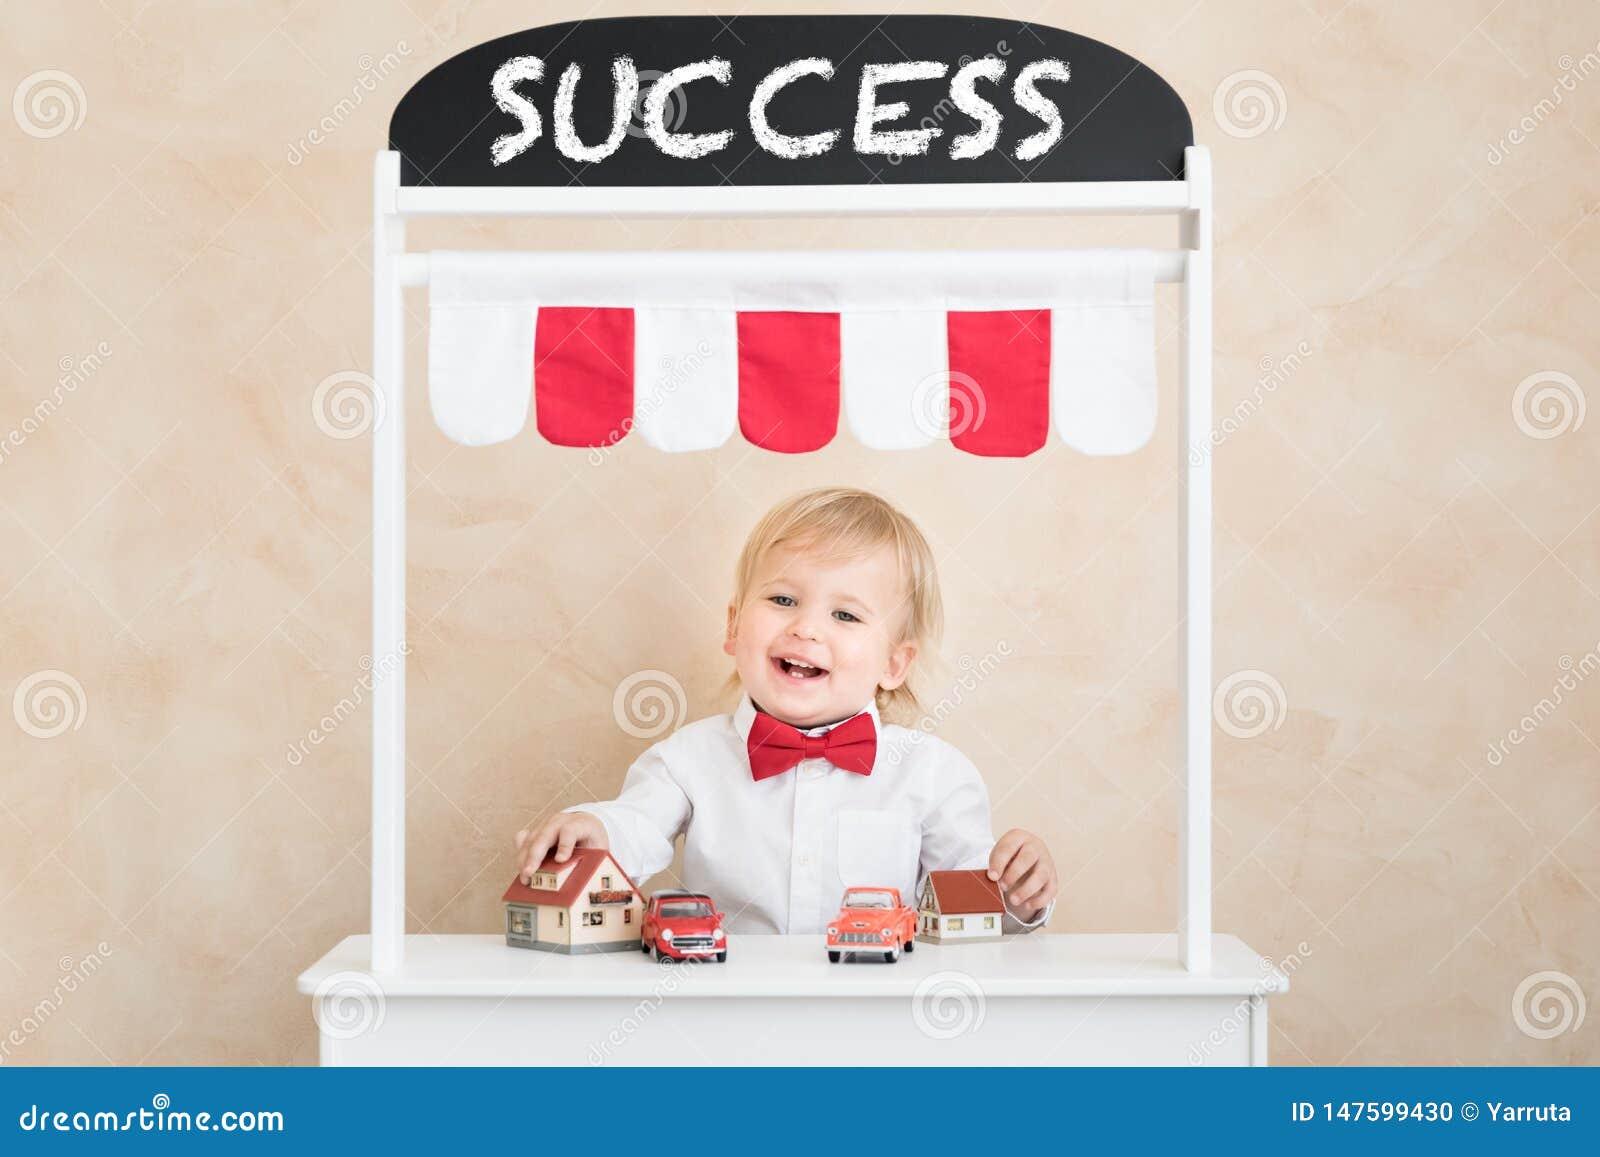 Erfolg, beginnen oben und Gesch?ftsideenkonzept